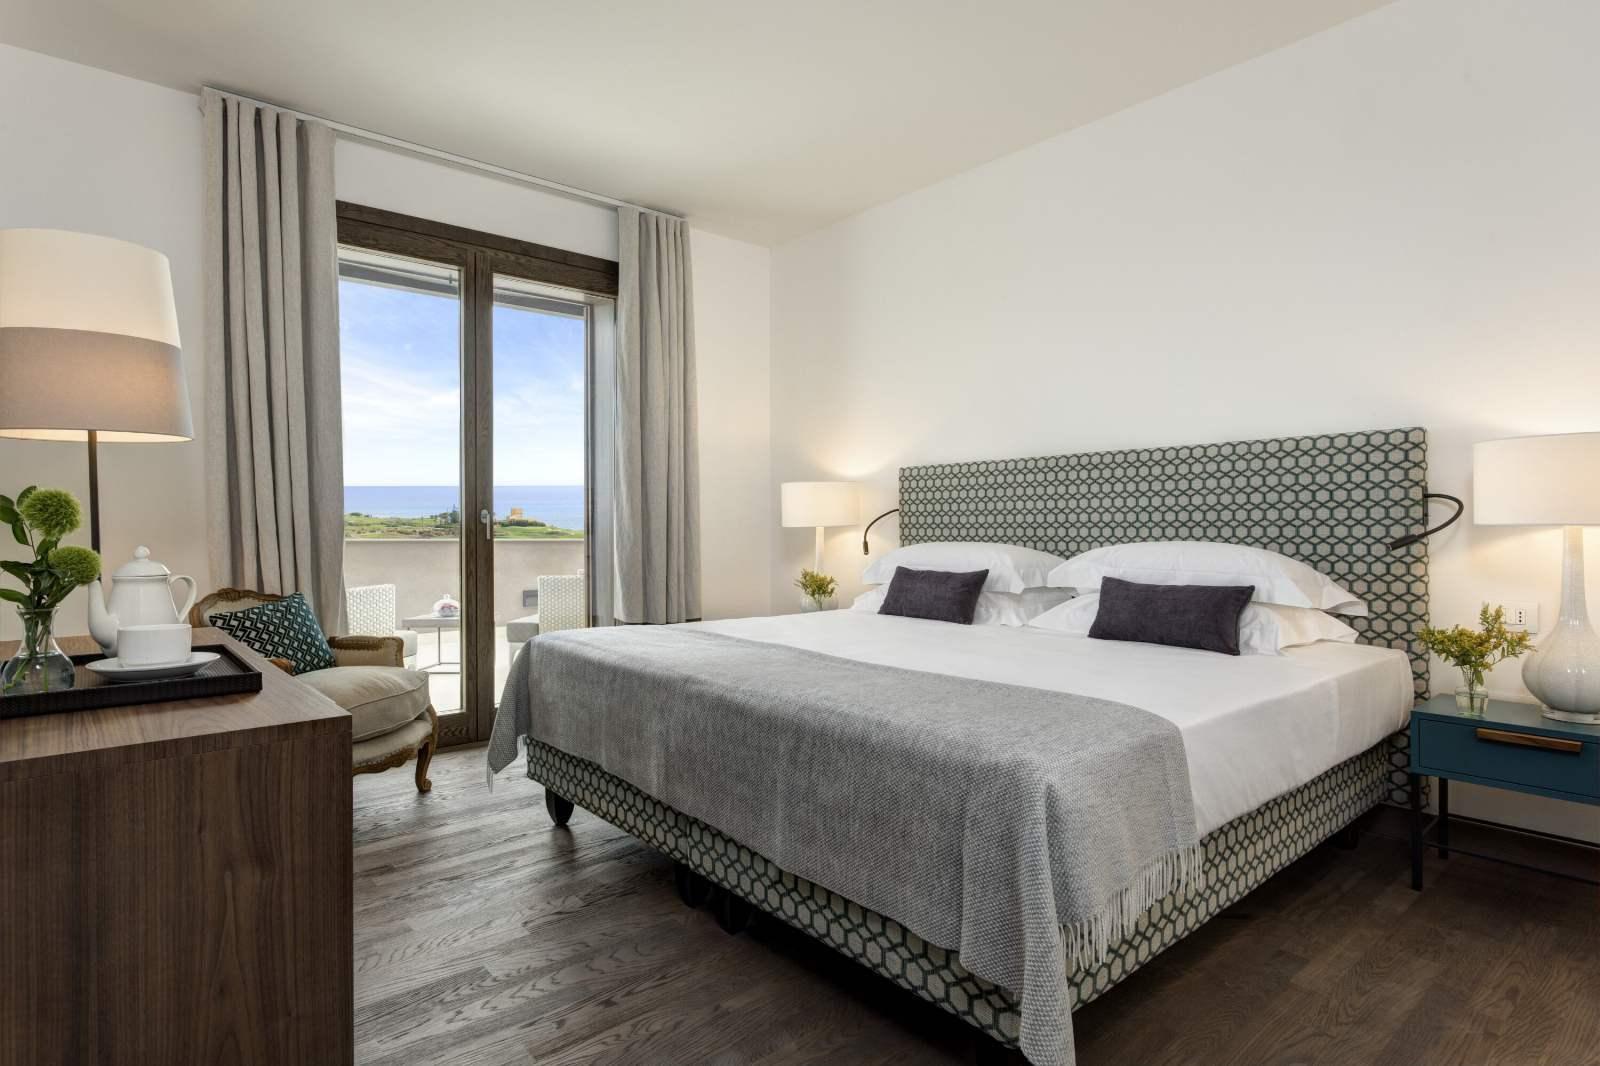 Verdura Resort: Private Villas: room / property / locale photo. Image 8